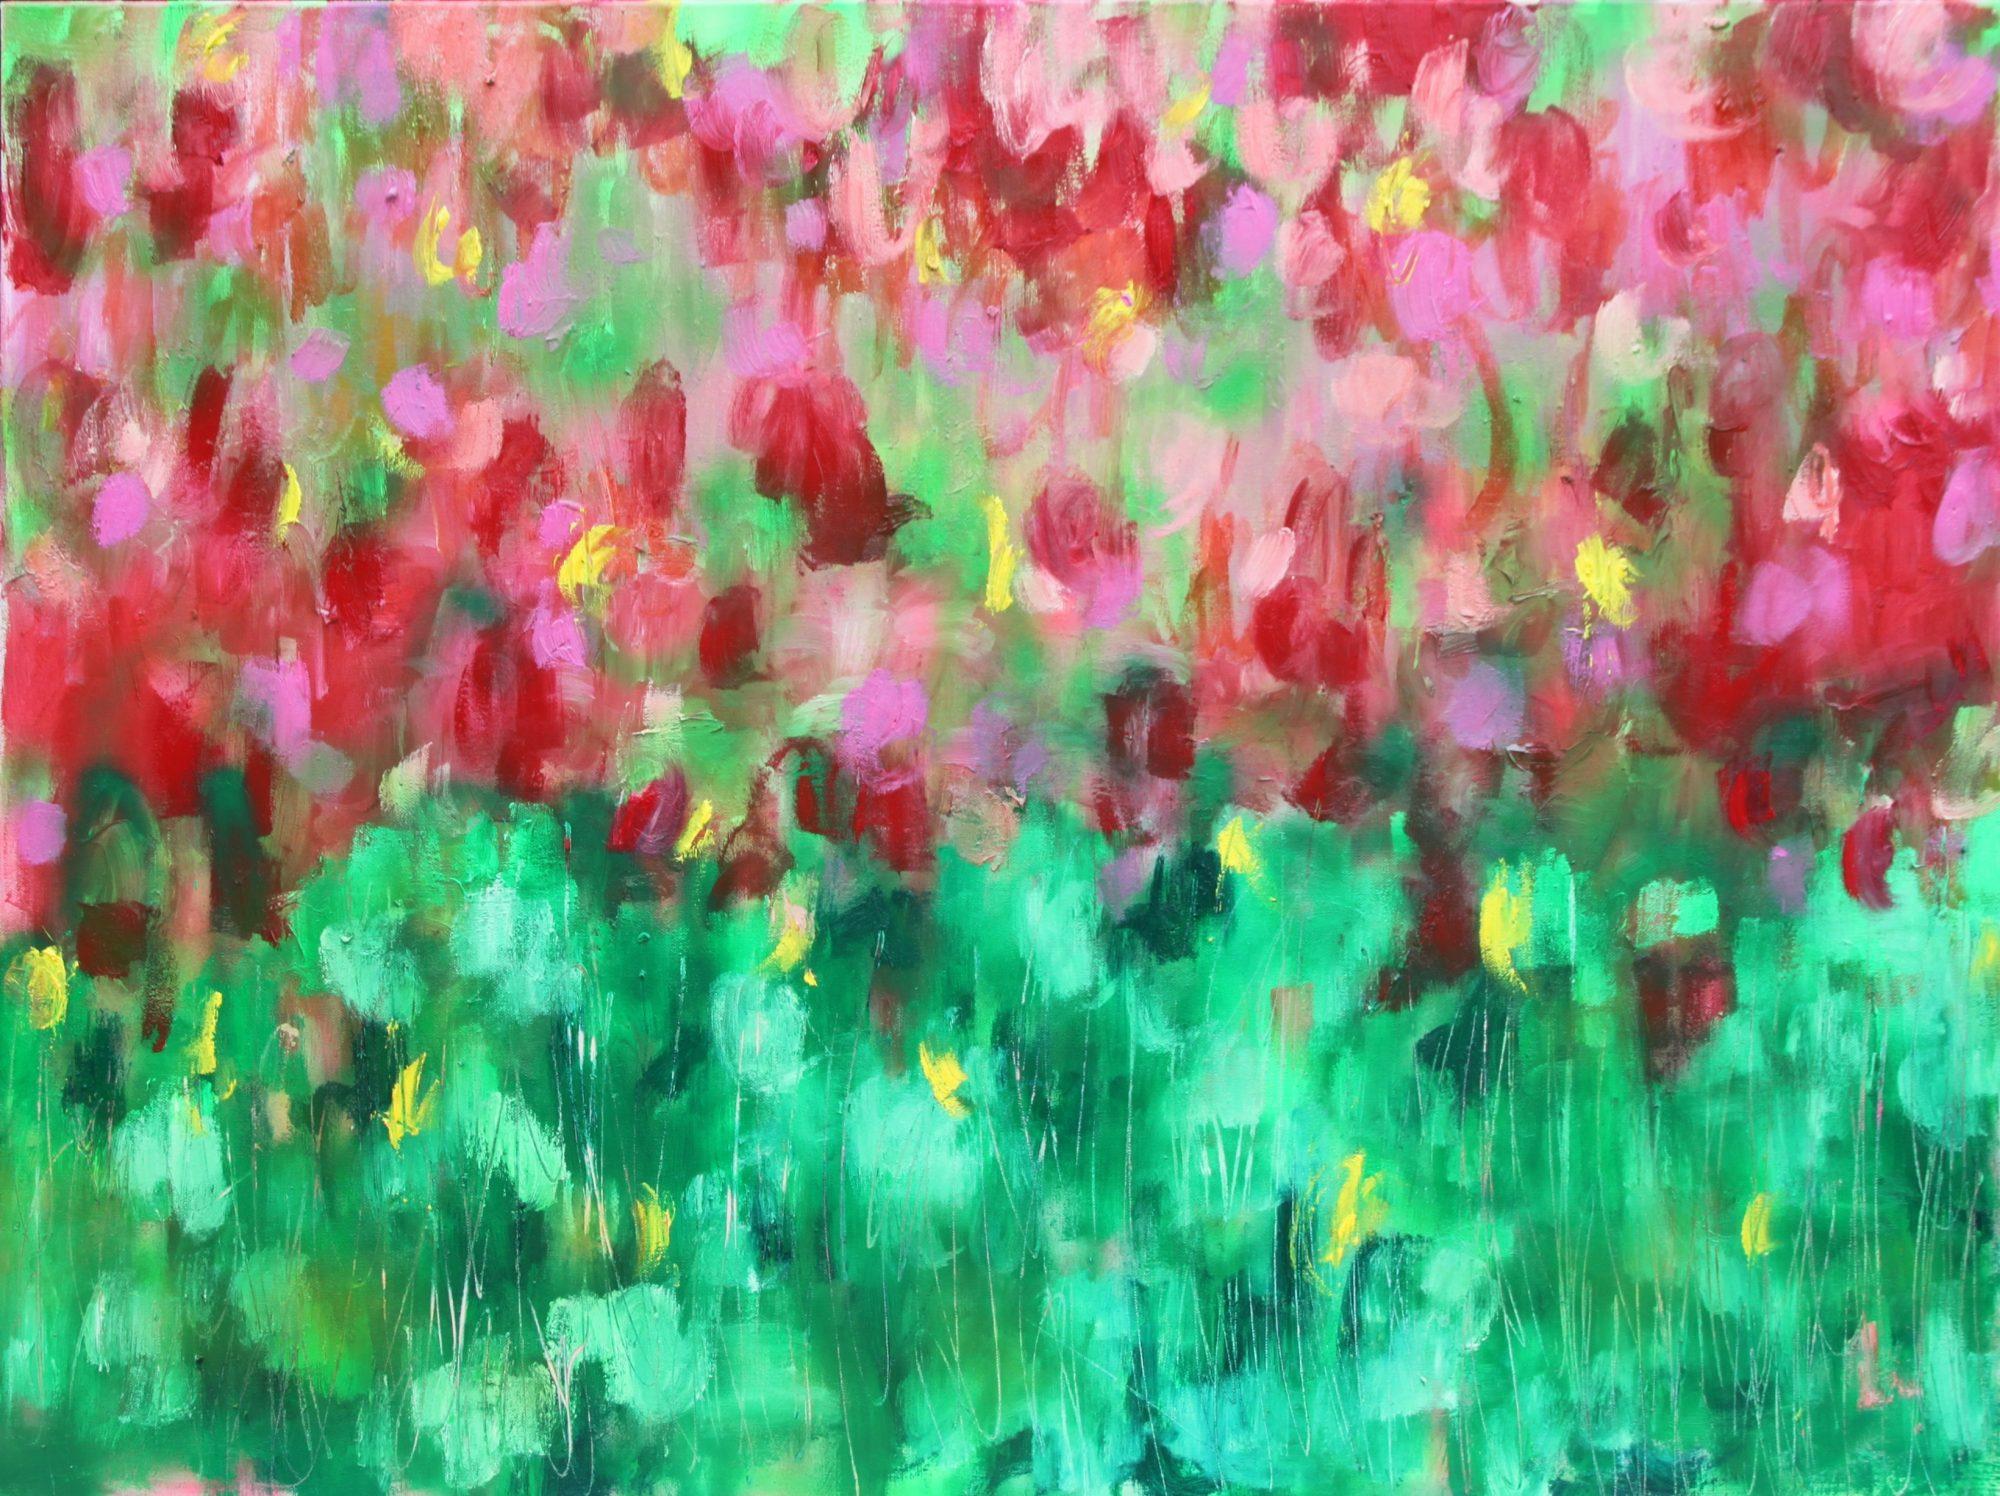 belinda-nadwie-art-australian-artist-summer-passion-22